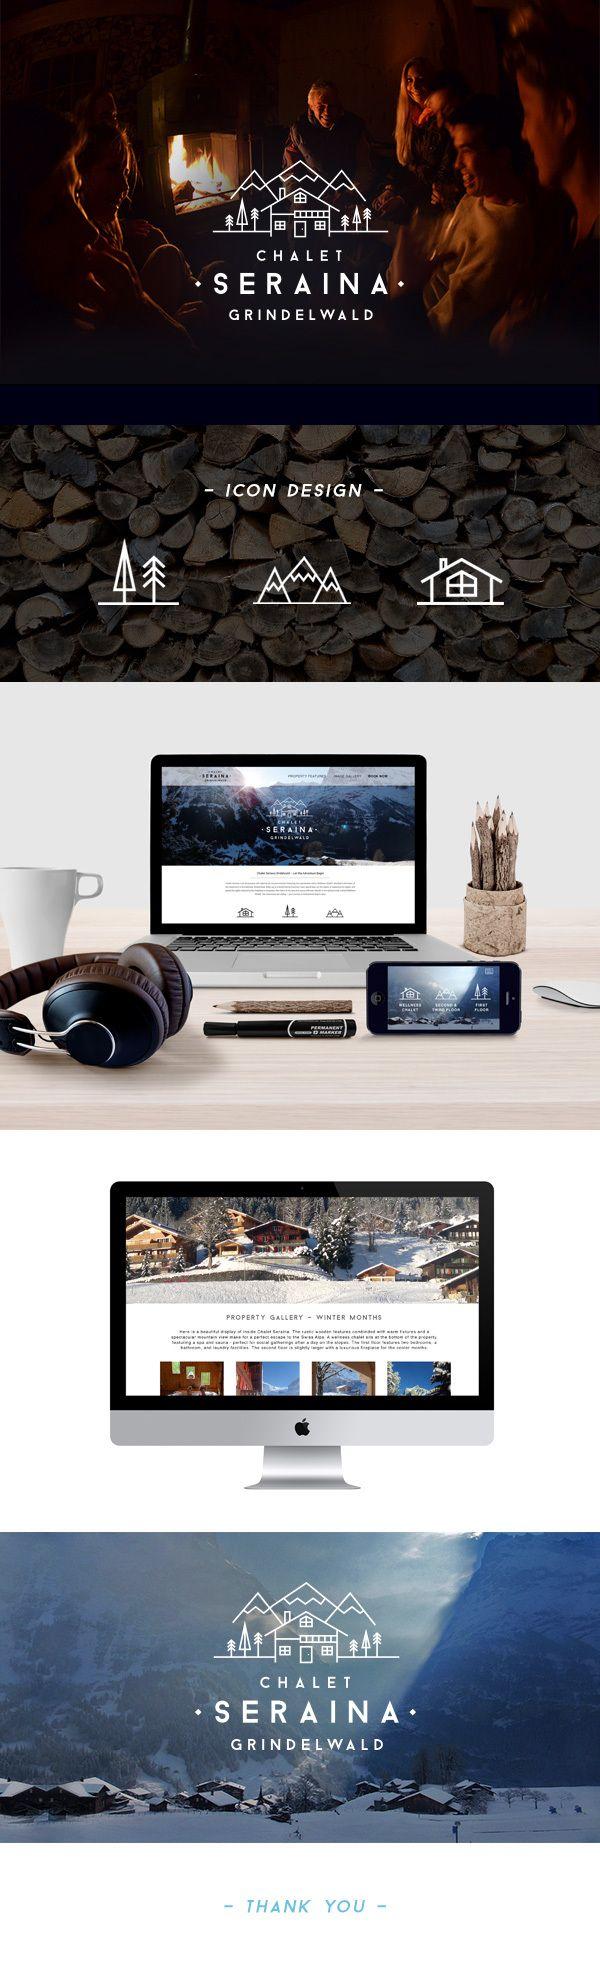 website design and logo development